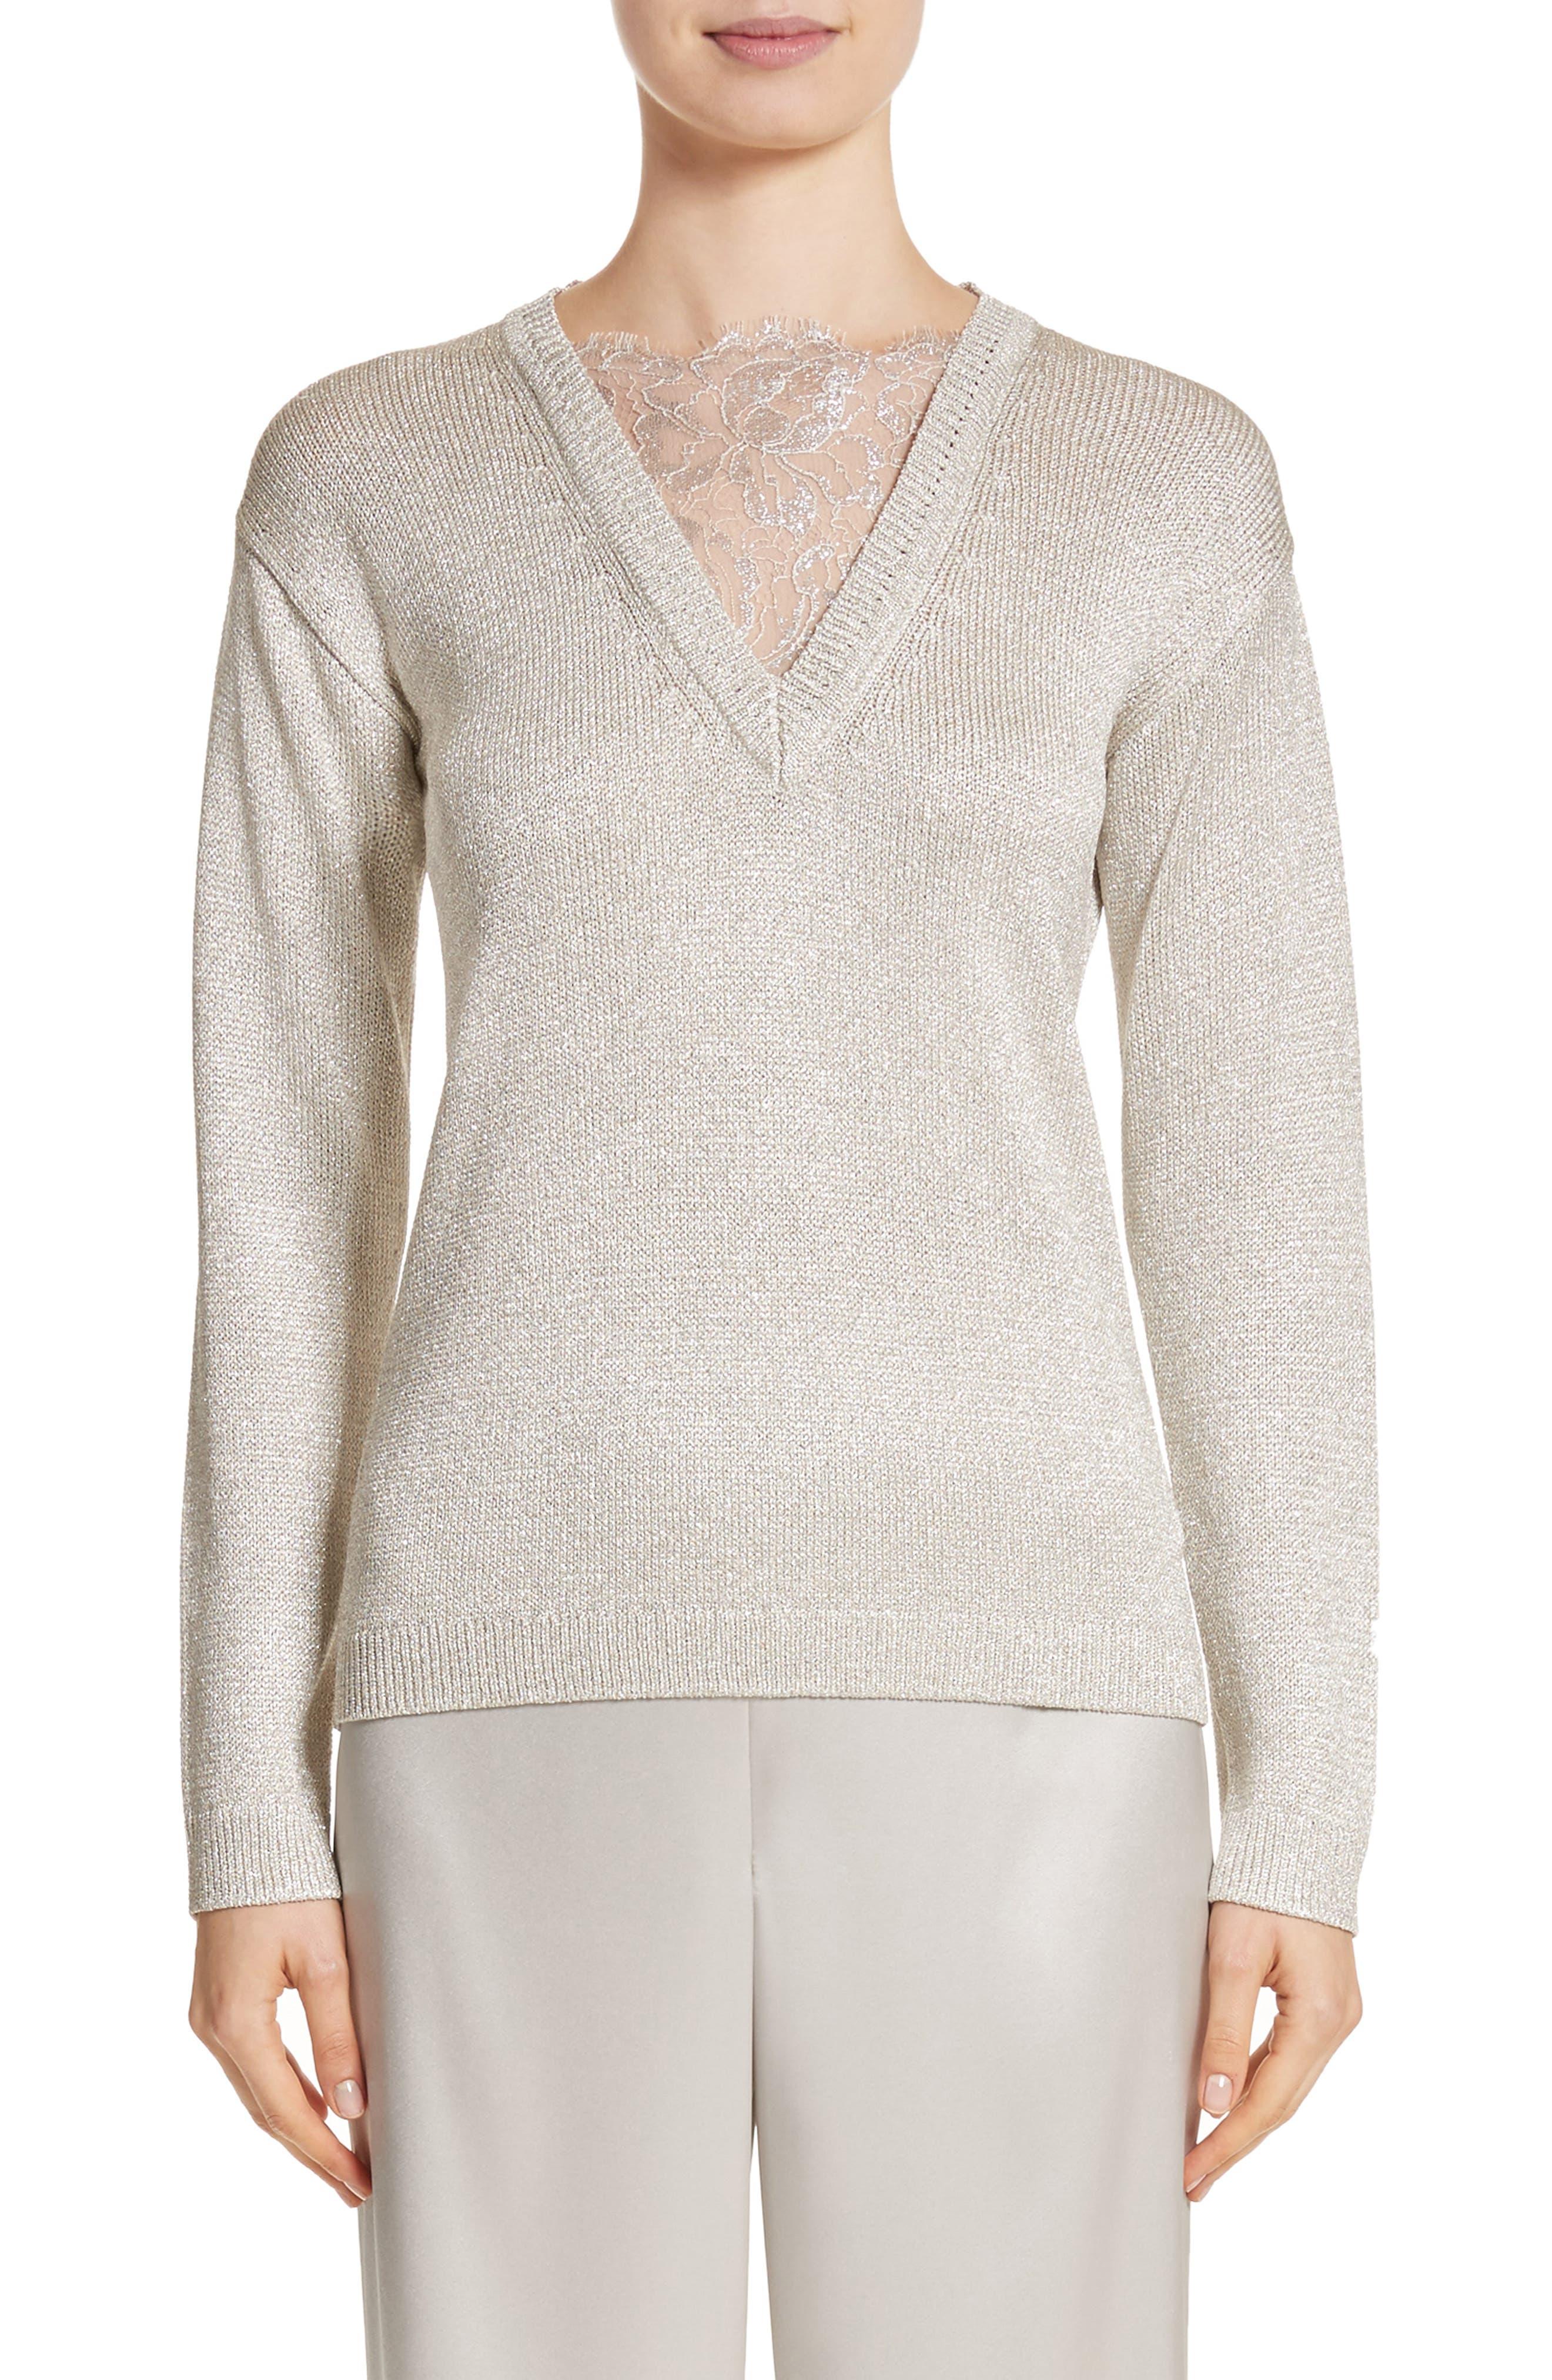 Alternate Image 1 Selected - St John Collection Metallic Jersey Knit Sweater